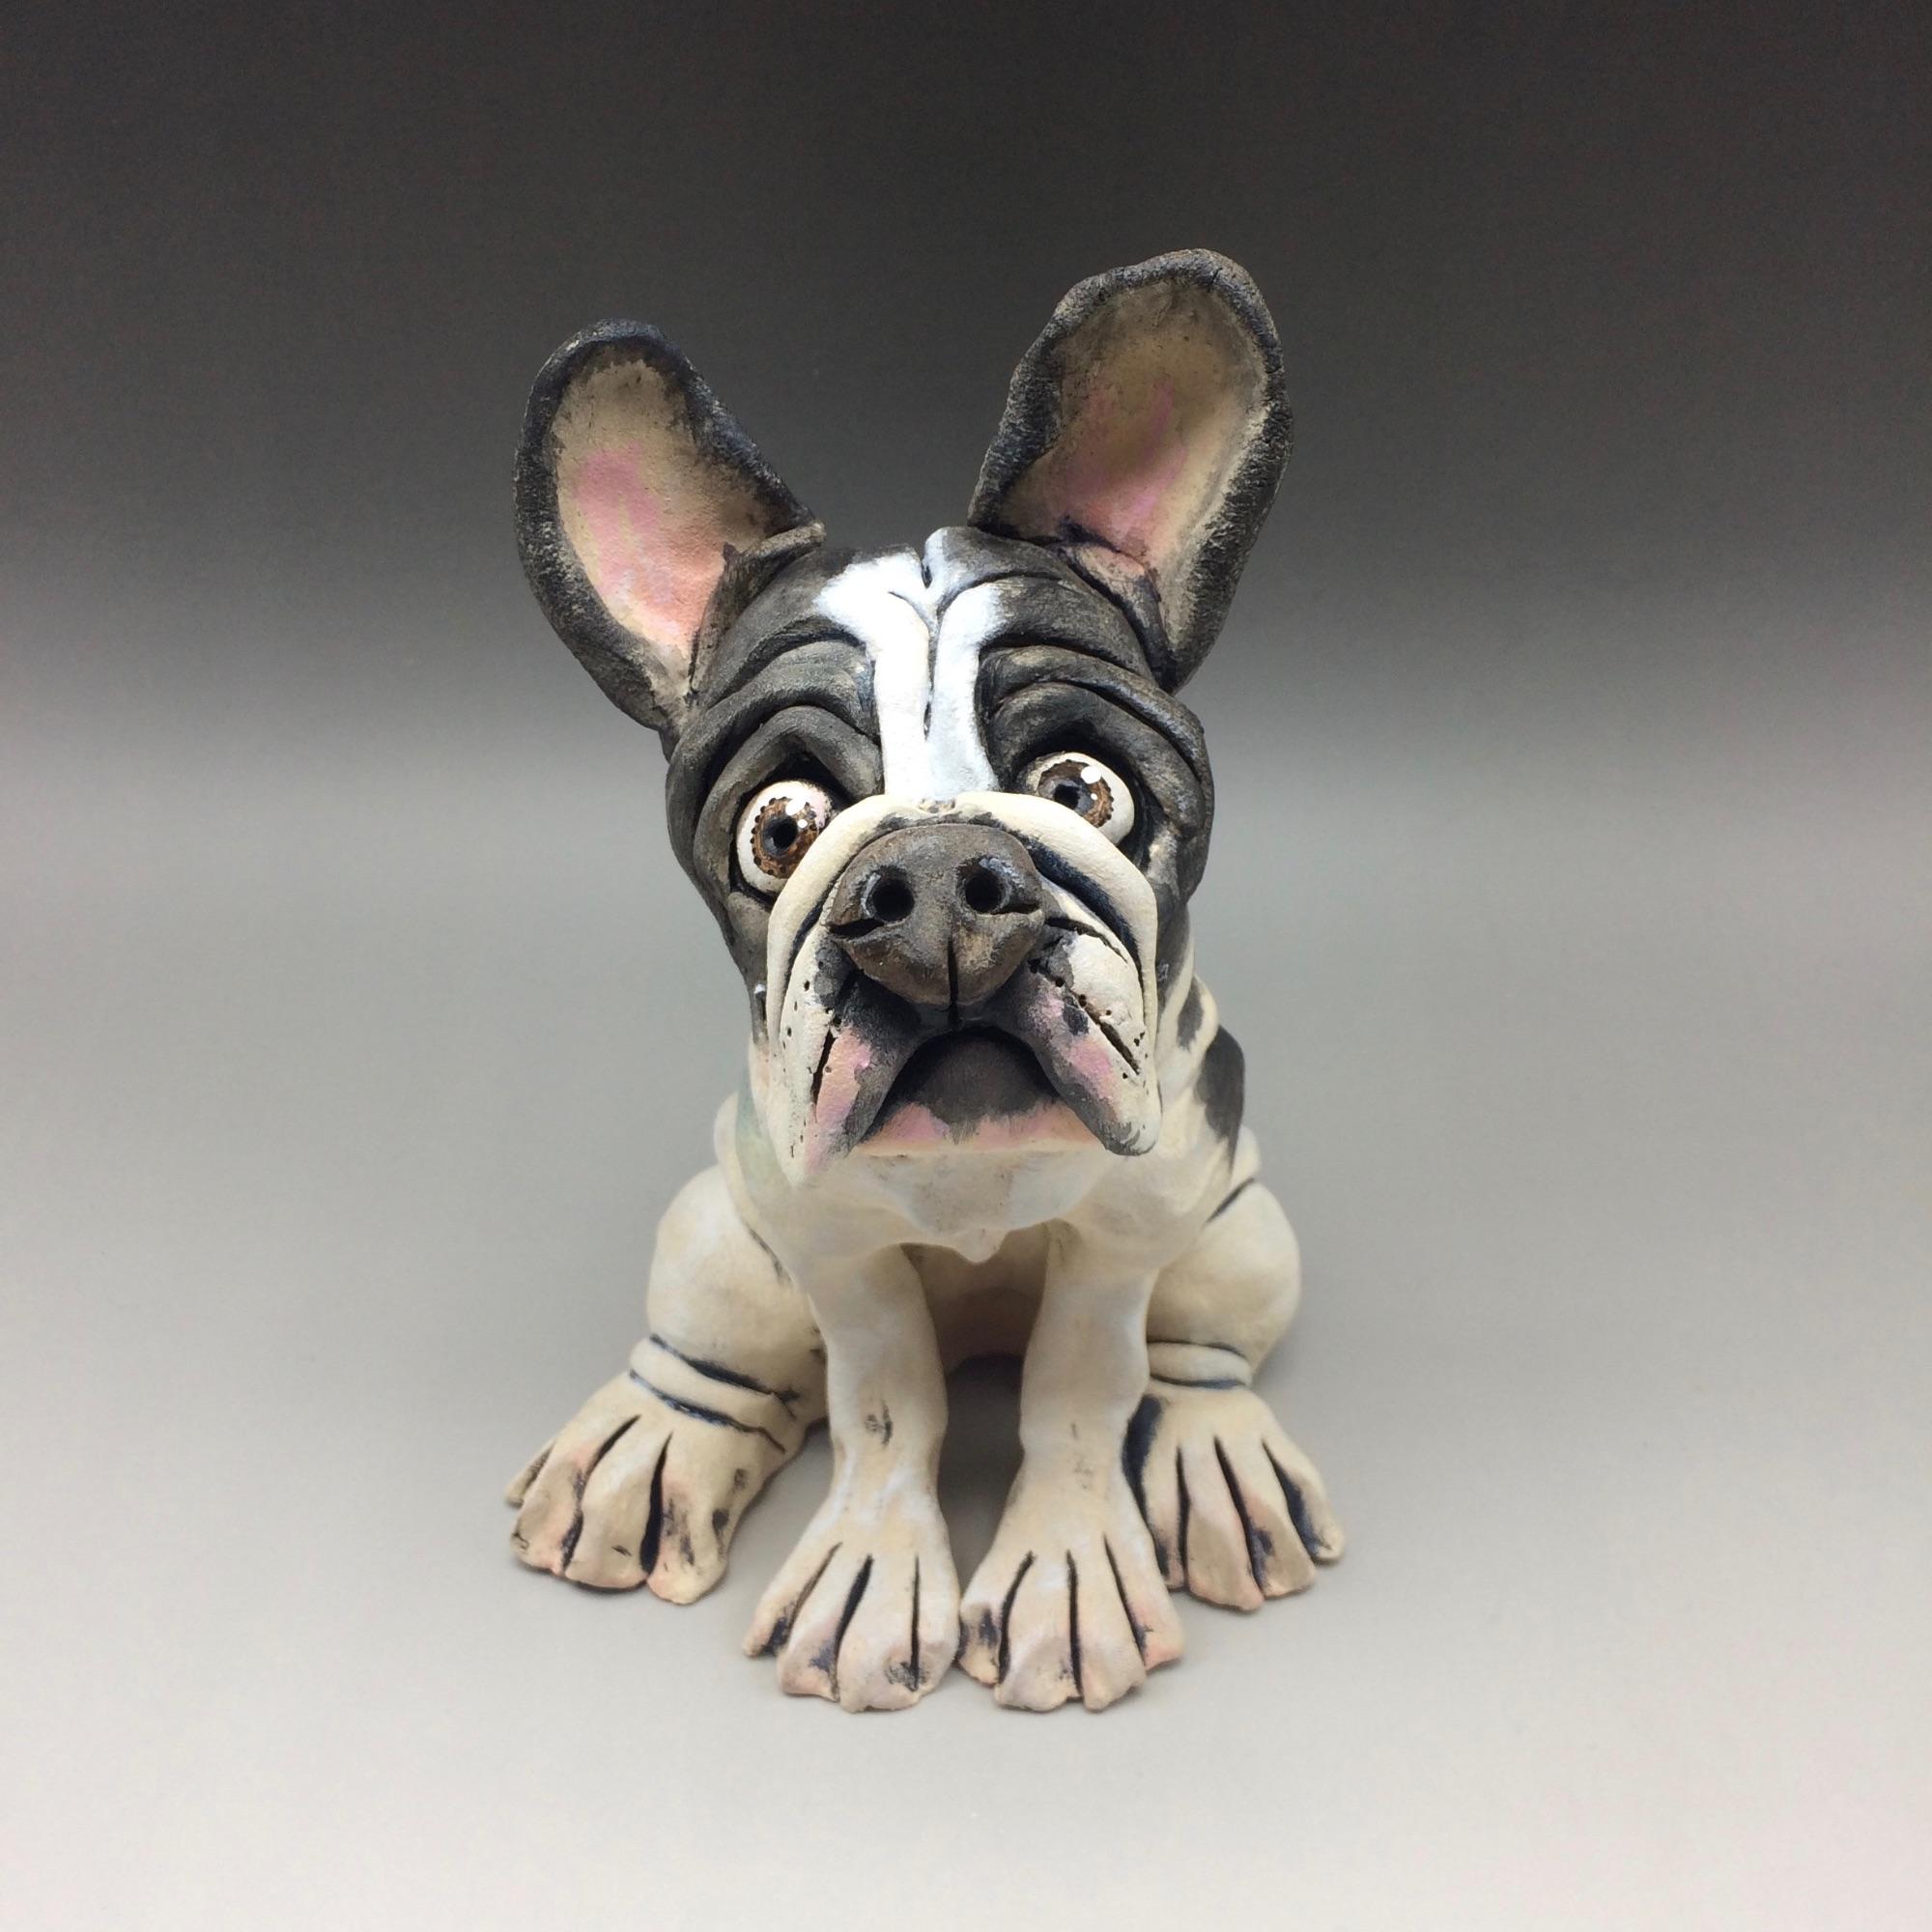 French Bulldog Sculptures Ceramic